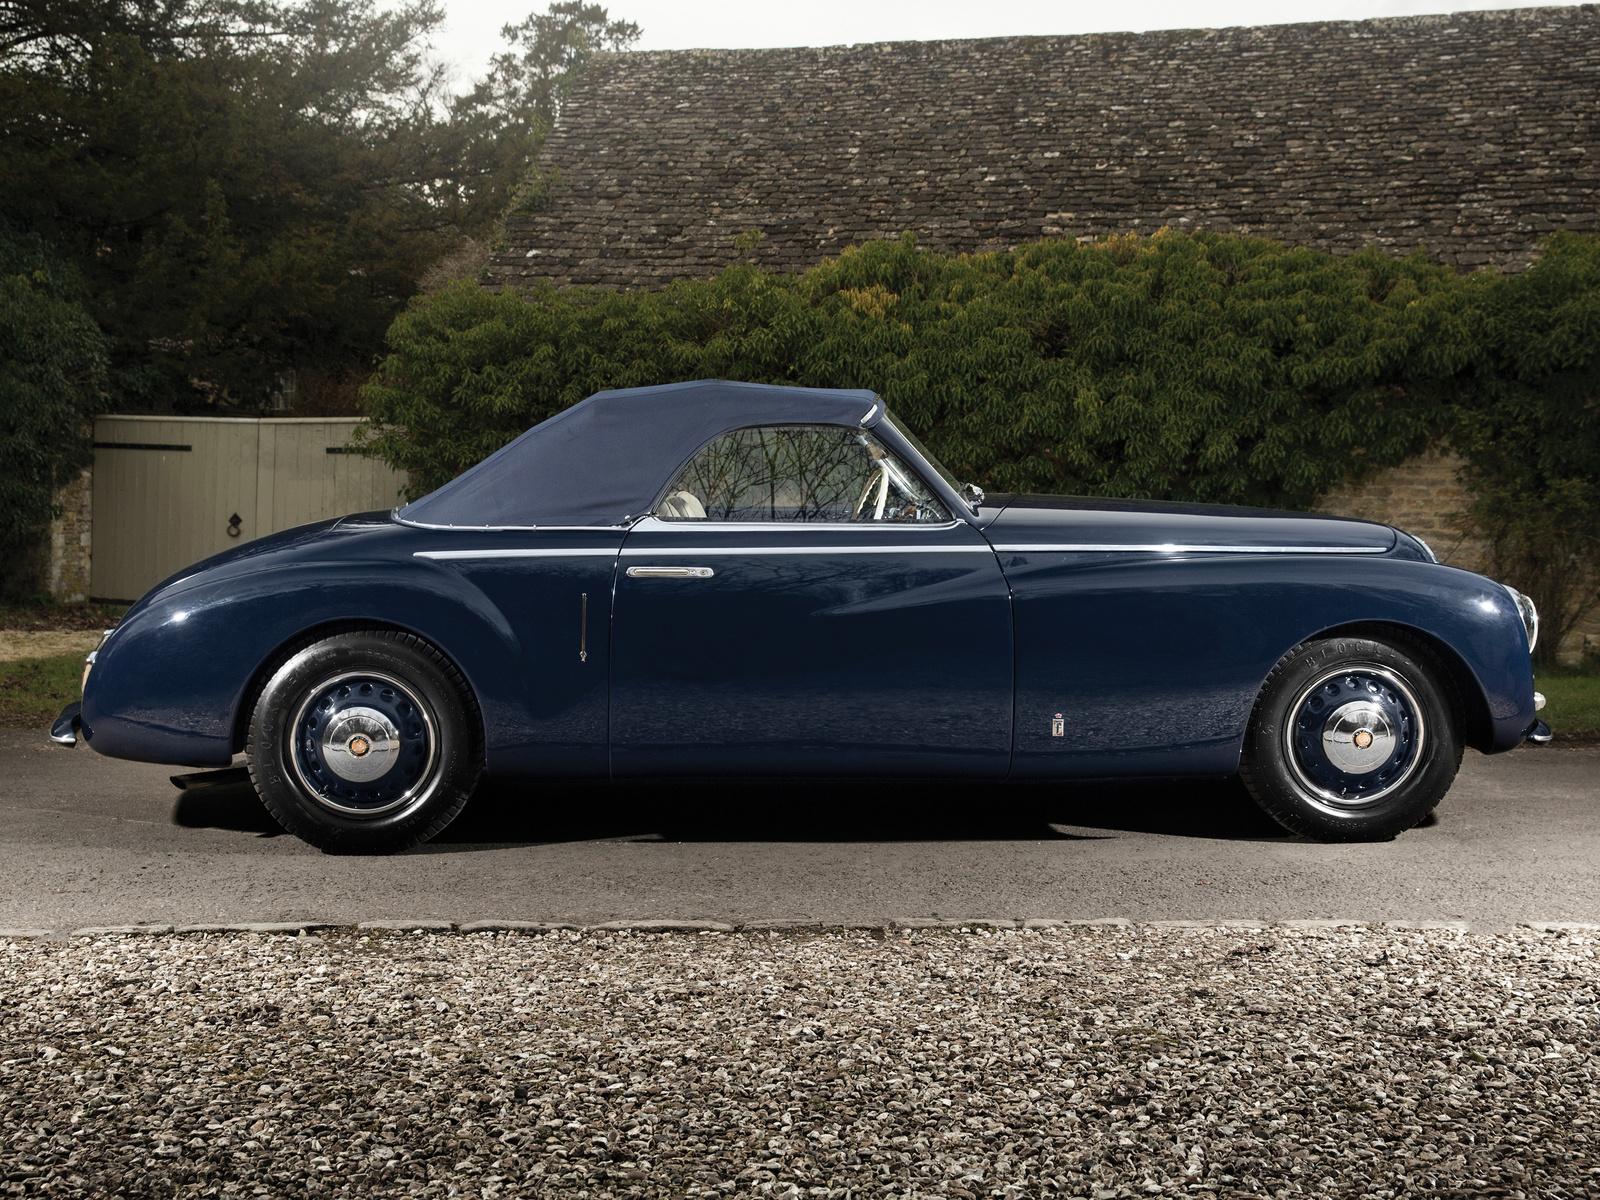 ретро, синий, металлик, сбоку, 1947, bristol, 400, cabriolet, pininfarina